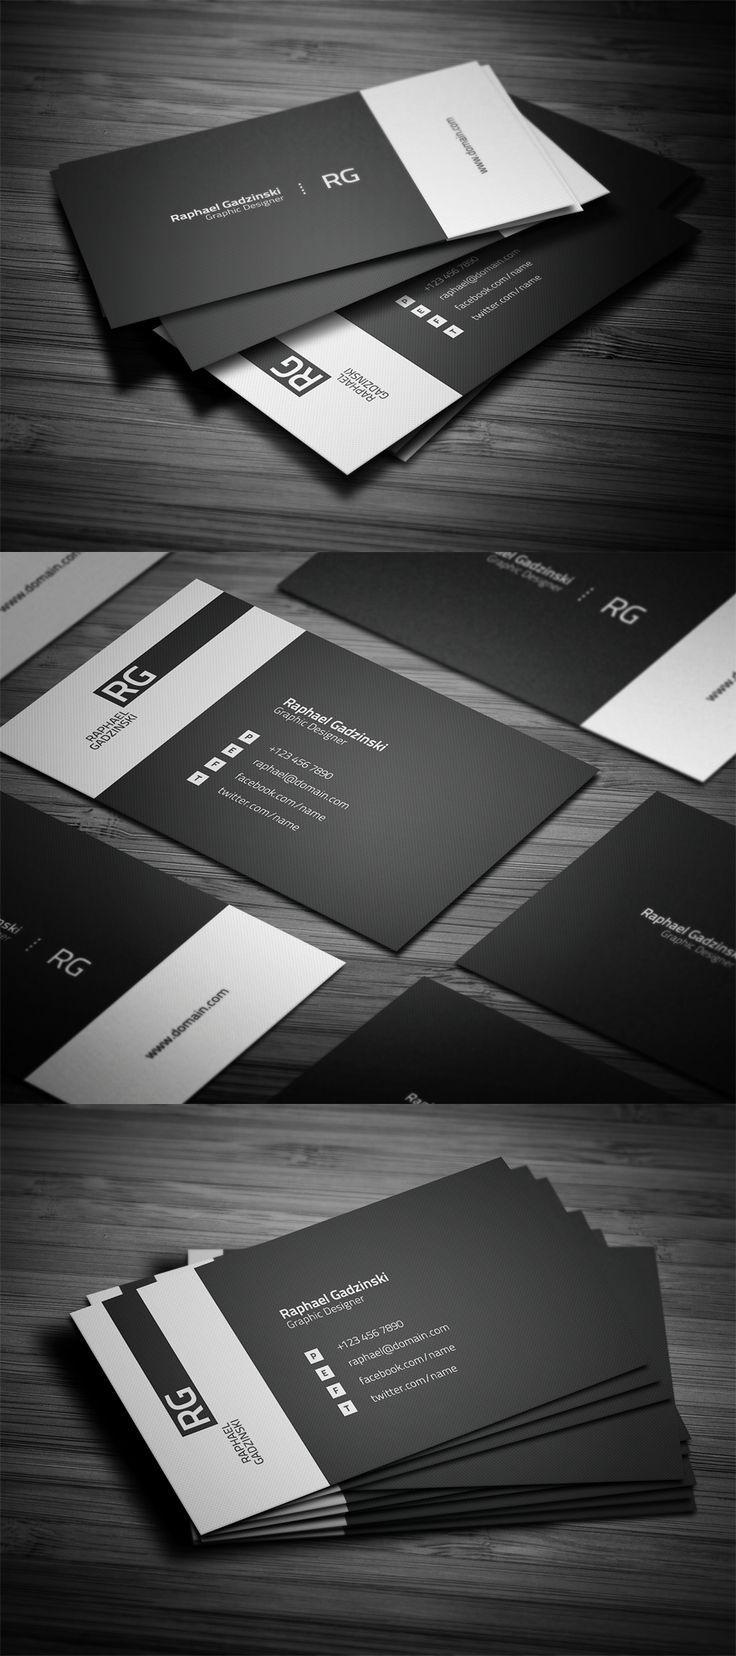 50 Creative Corporate Business Card Design examples - Design inspiration